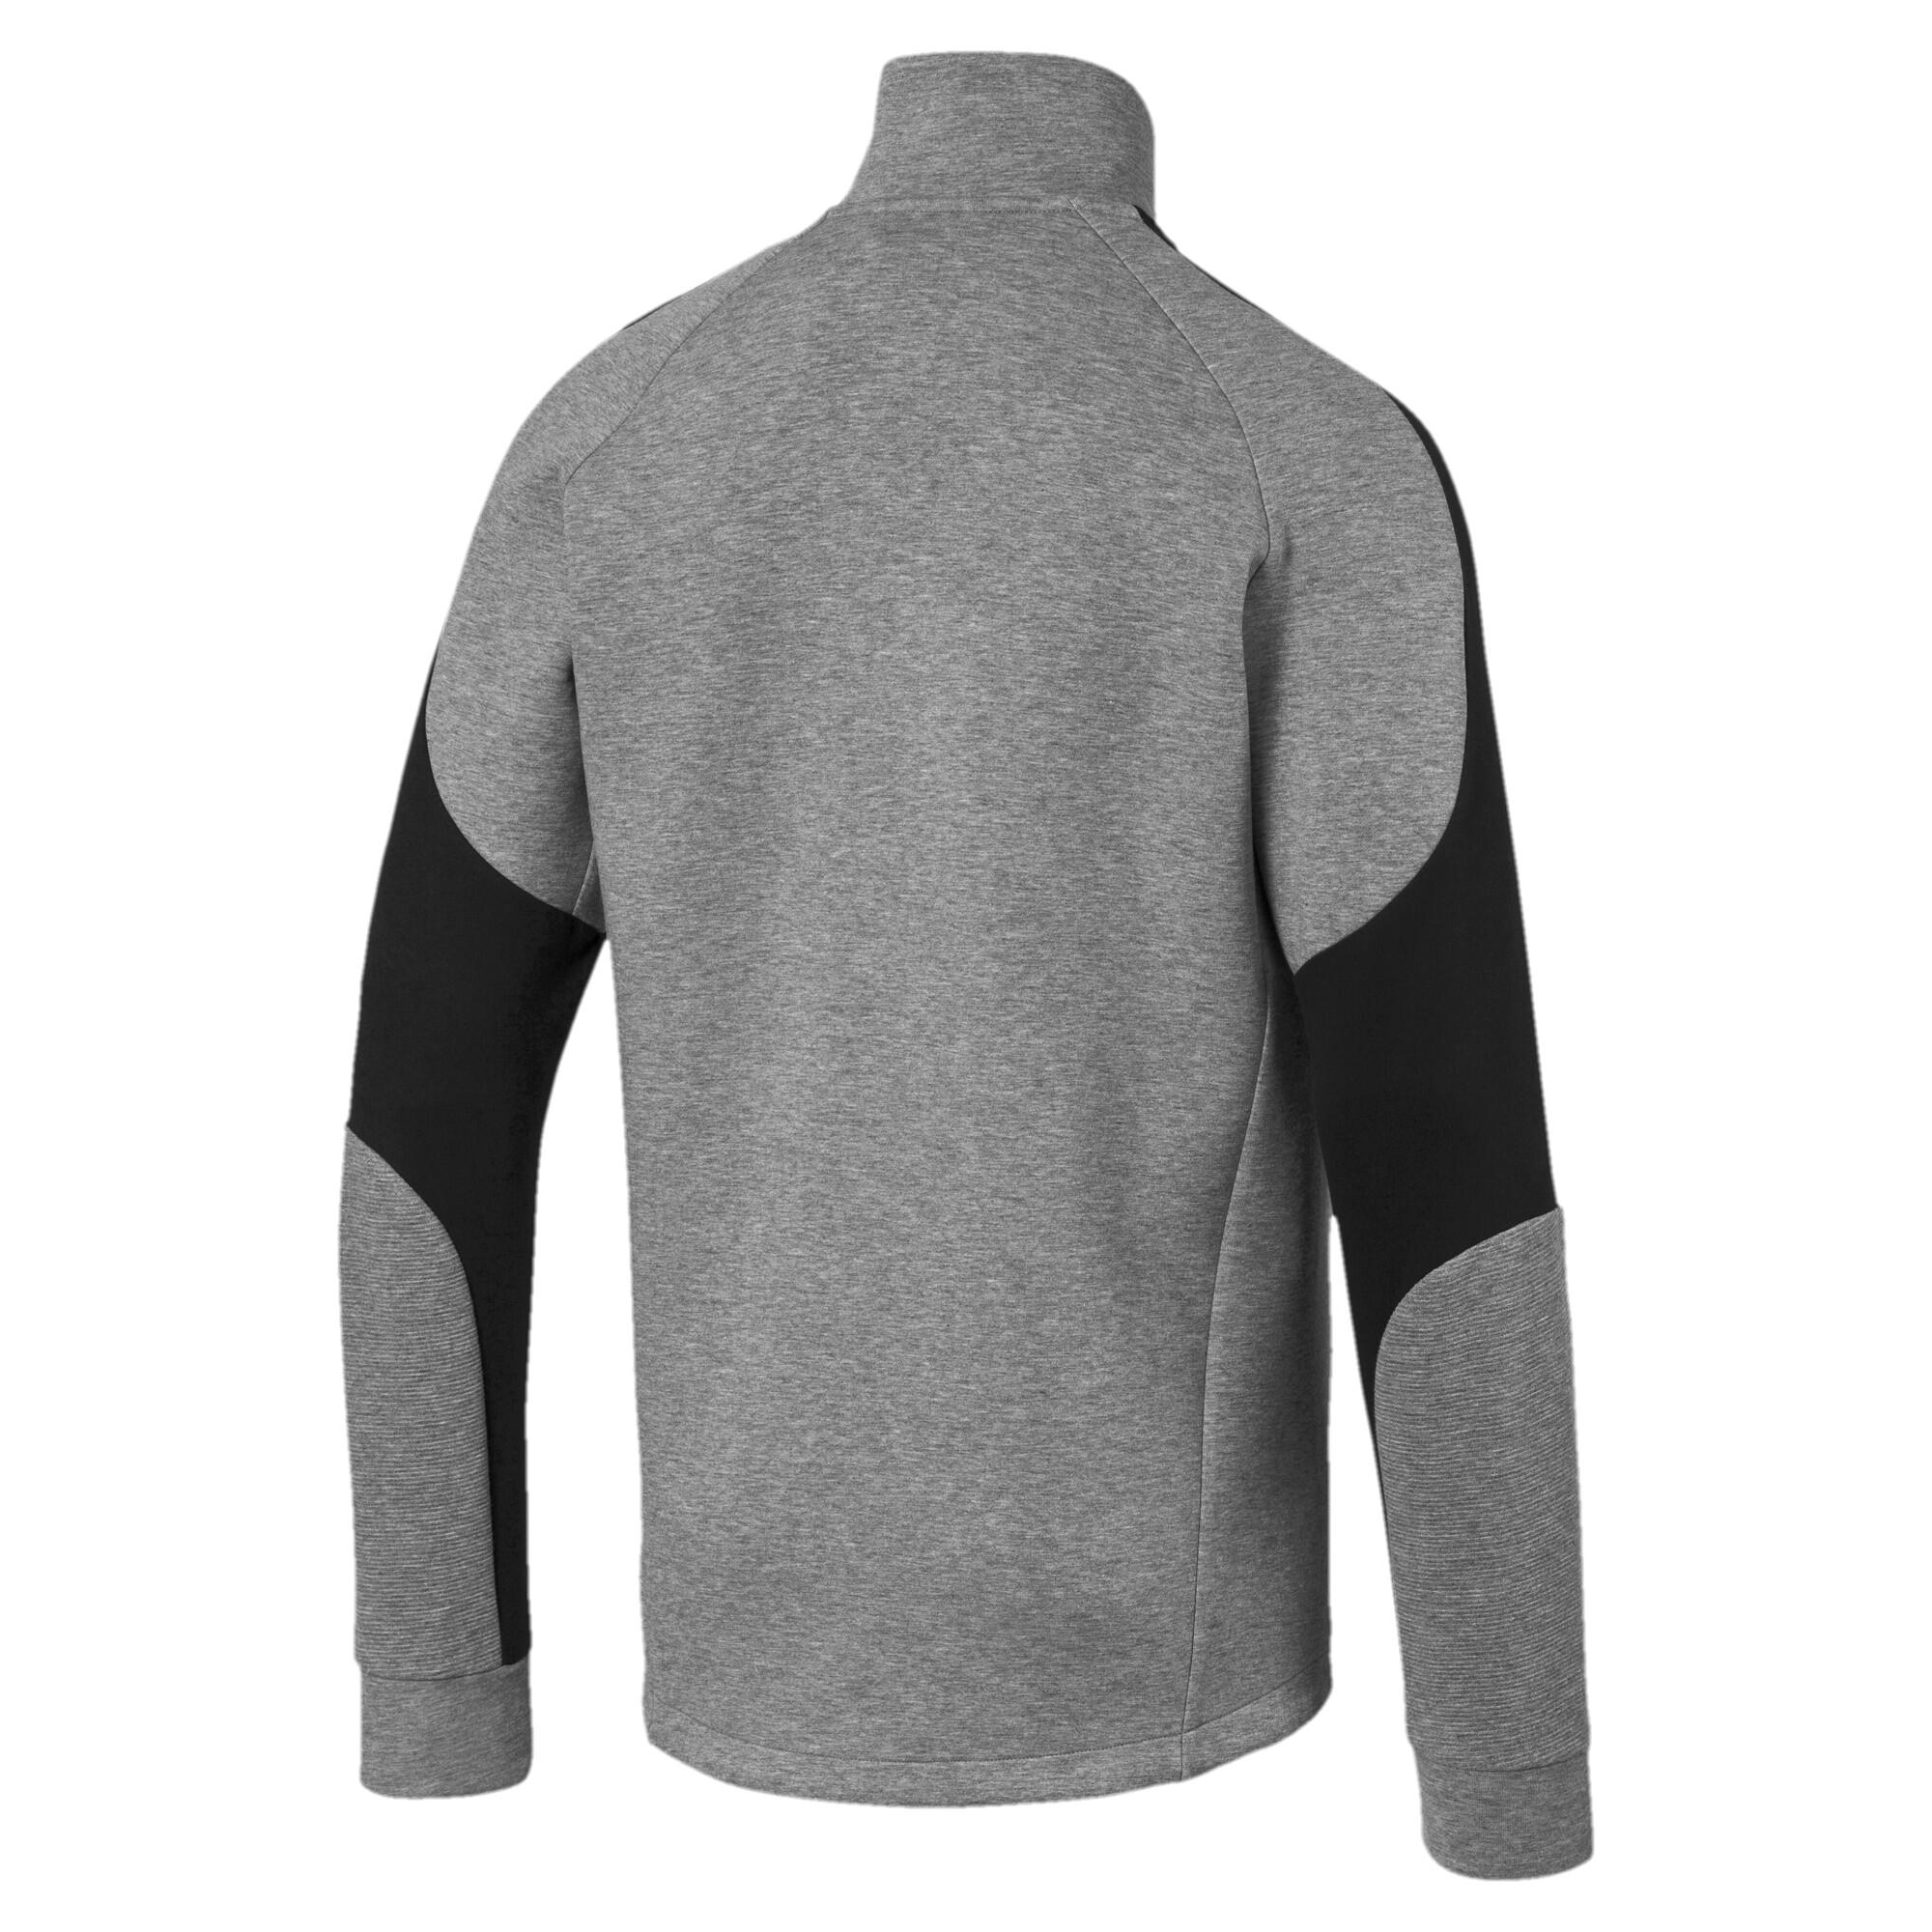 PUMA-Evostripe-Men-039-s-Jacket-Men-Sweat-Basics thumbnail 8